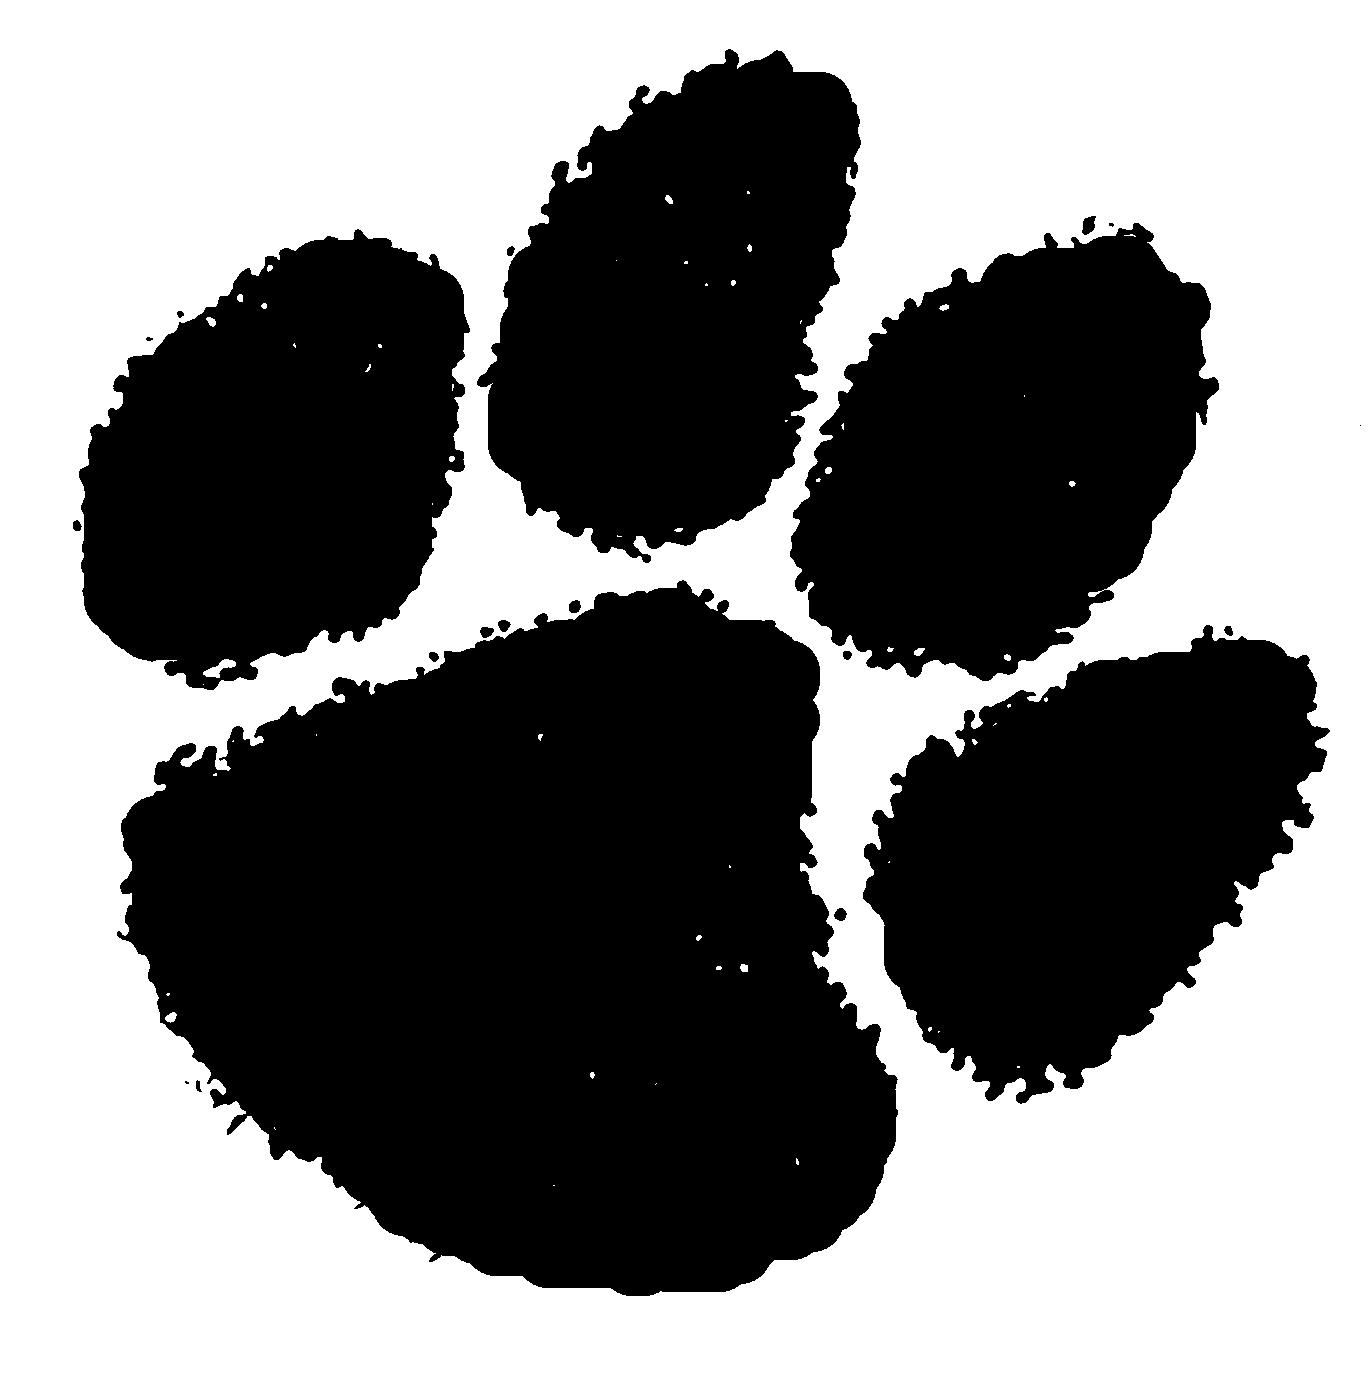 Cougar paw print clipart jpg library 66+ Cougar Paw Print Clip Art | ClipartLook jpg library